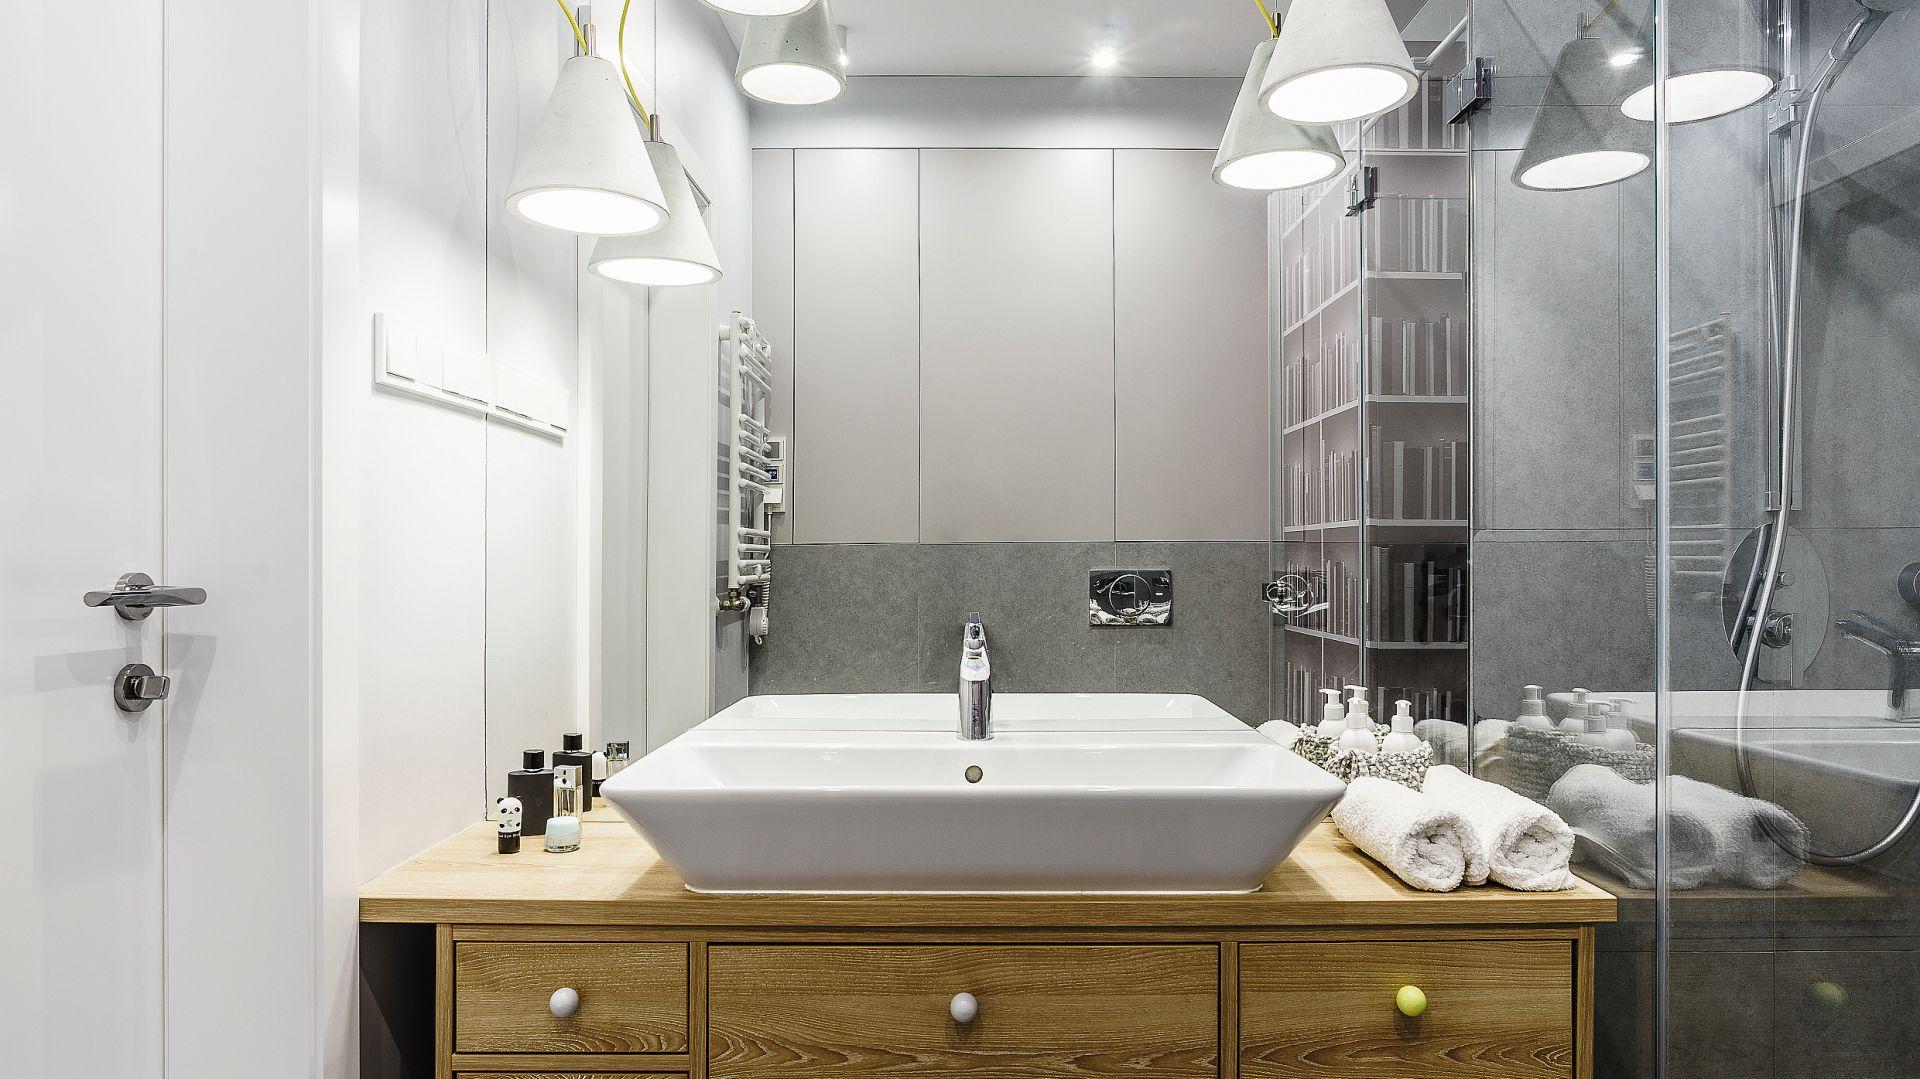 Łazienka przy sypialni. Projekt: Joanna Morkowska-Saj. Fot. Foto&Mohito